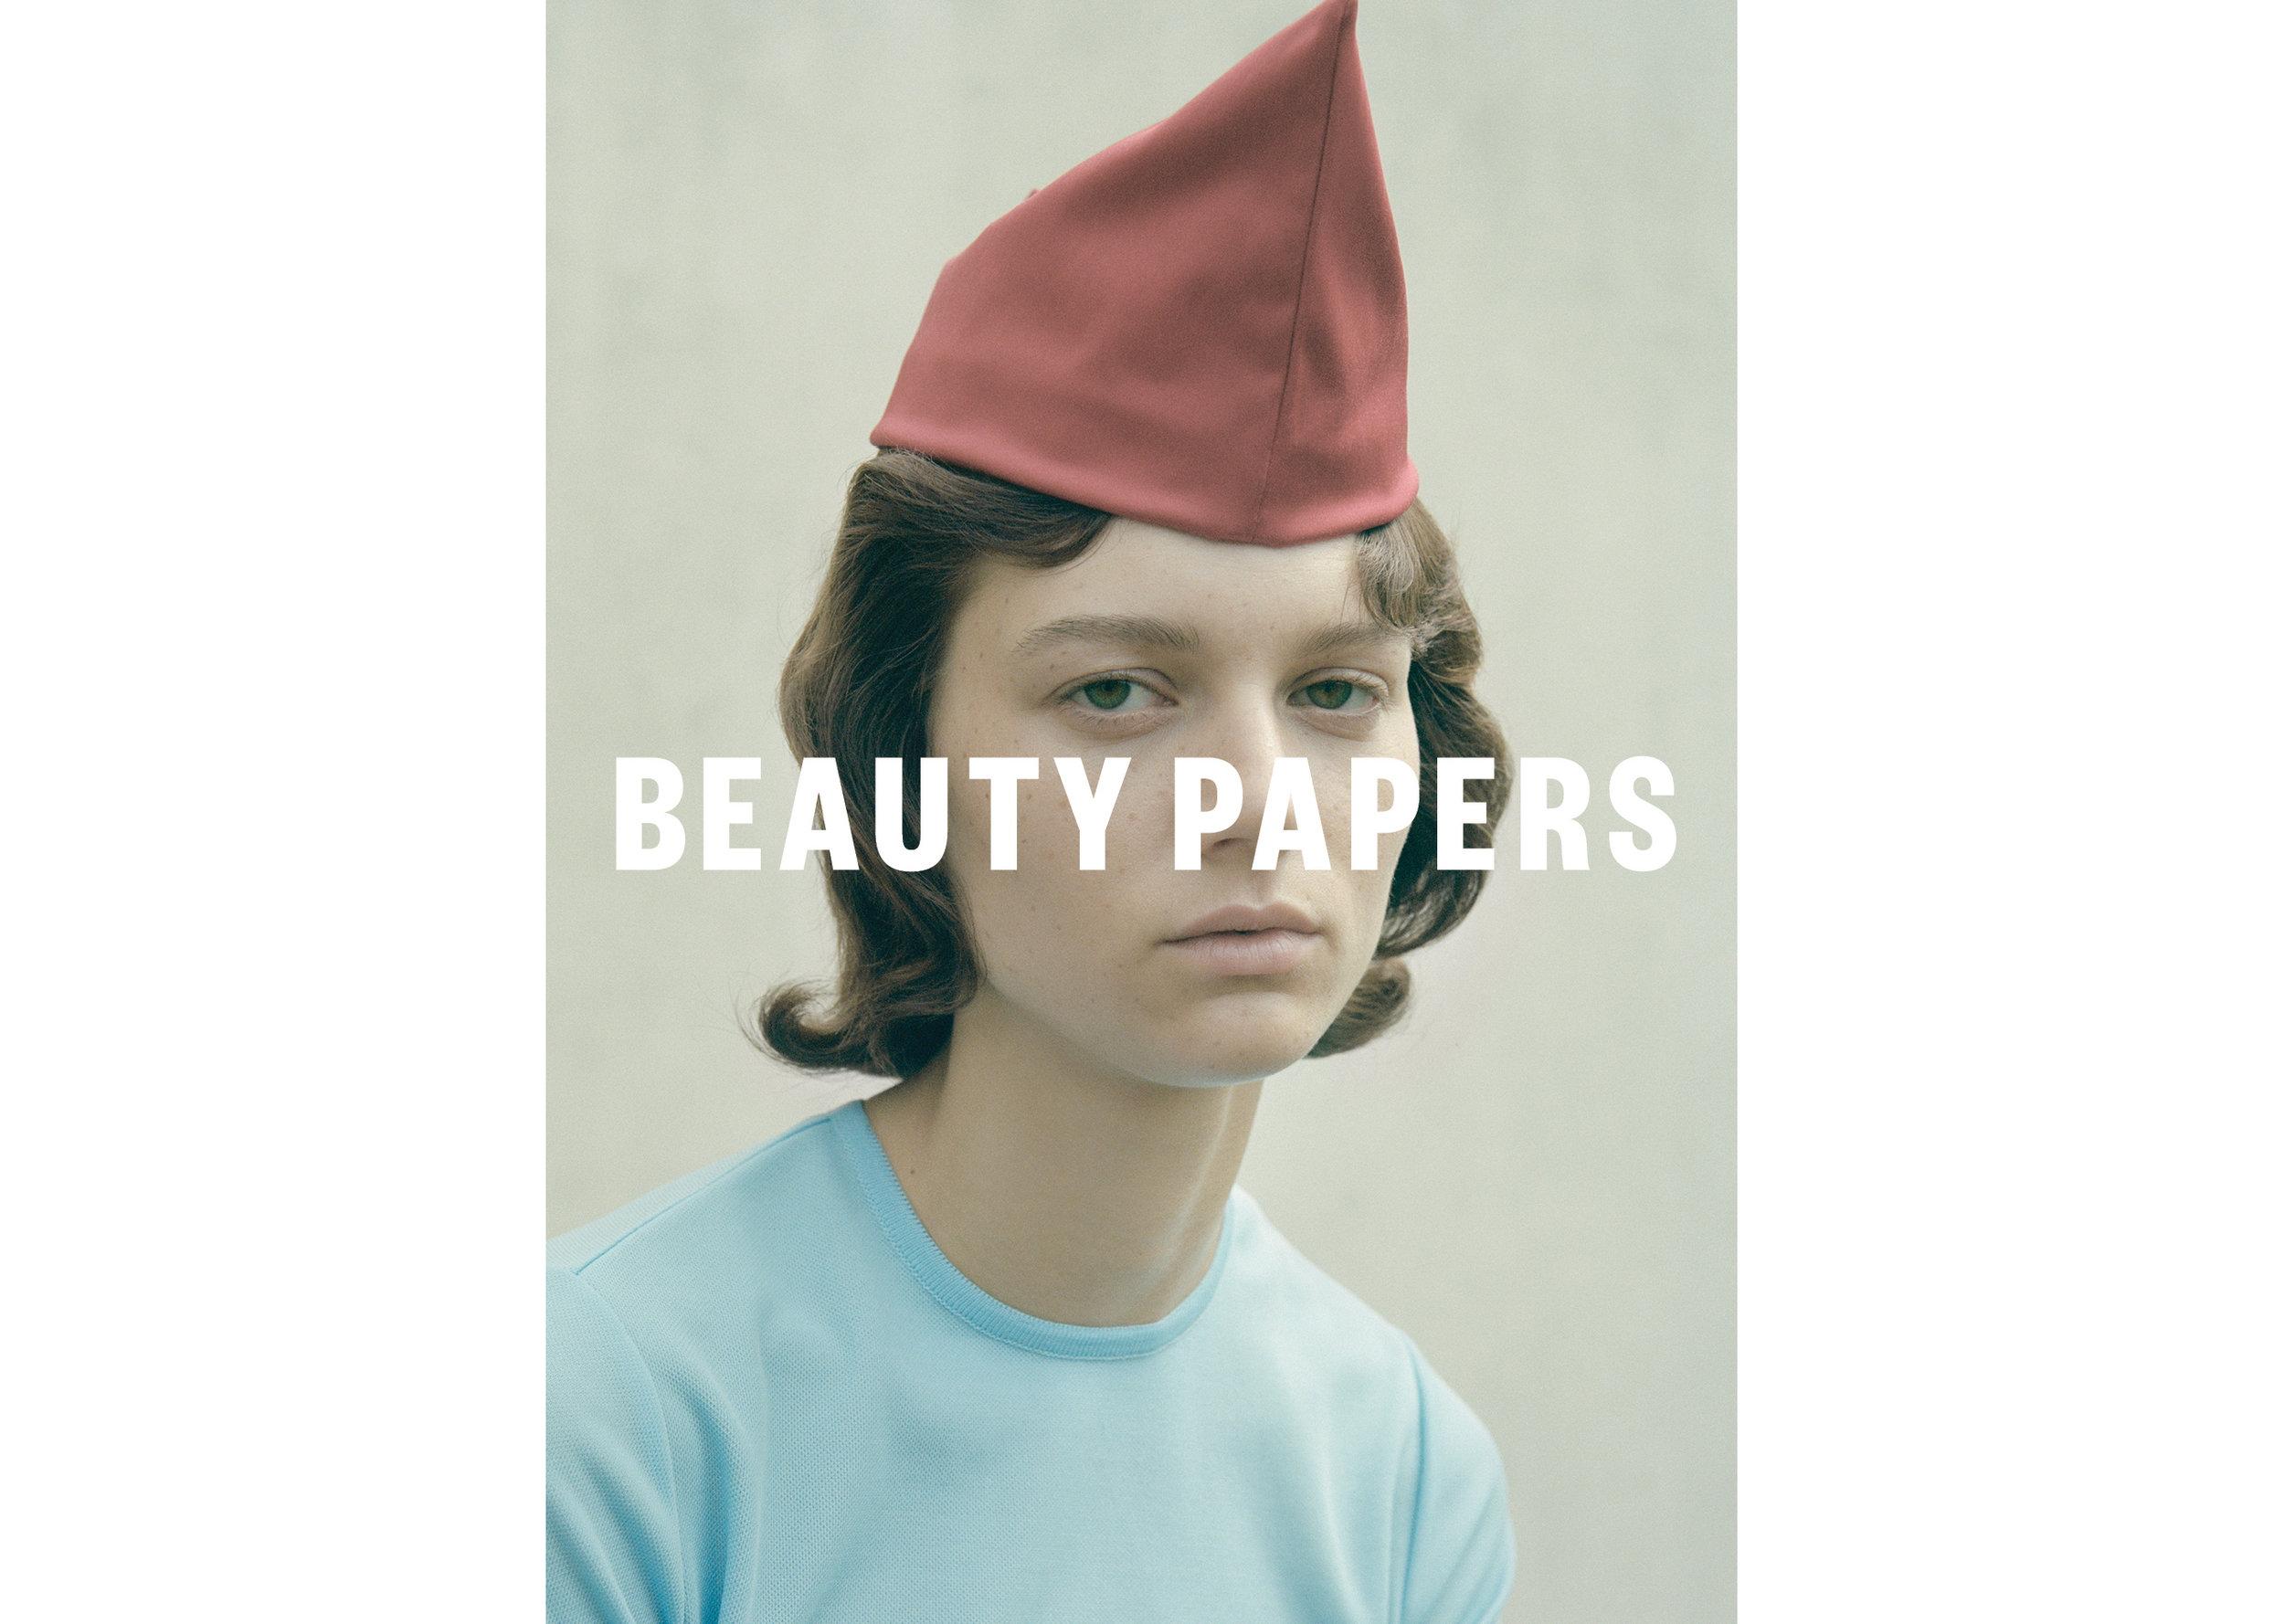 BeautyPapers#4 Marton Perlaki Cover.jpg